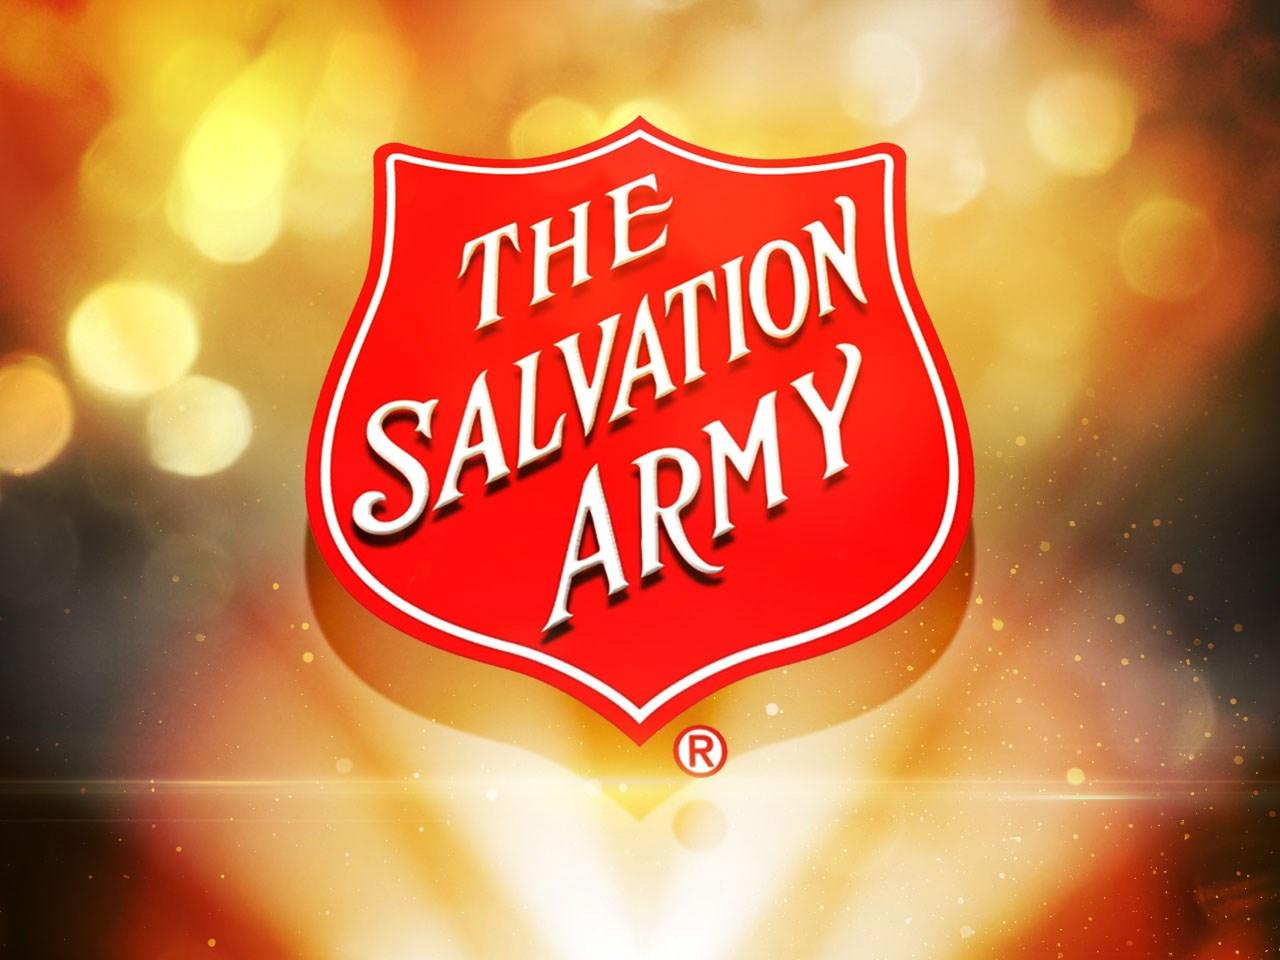 SALVATION ARMY 2_1502887367955.jpg